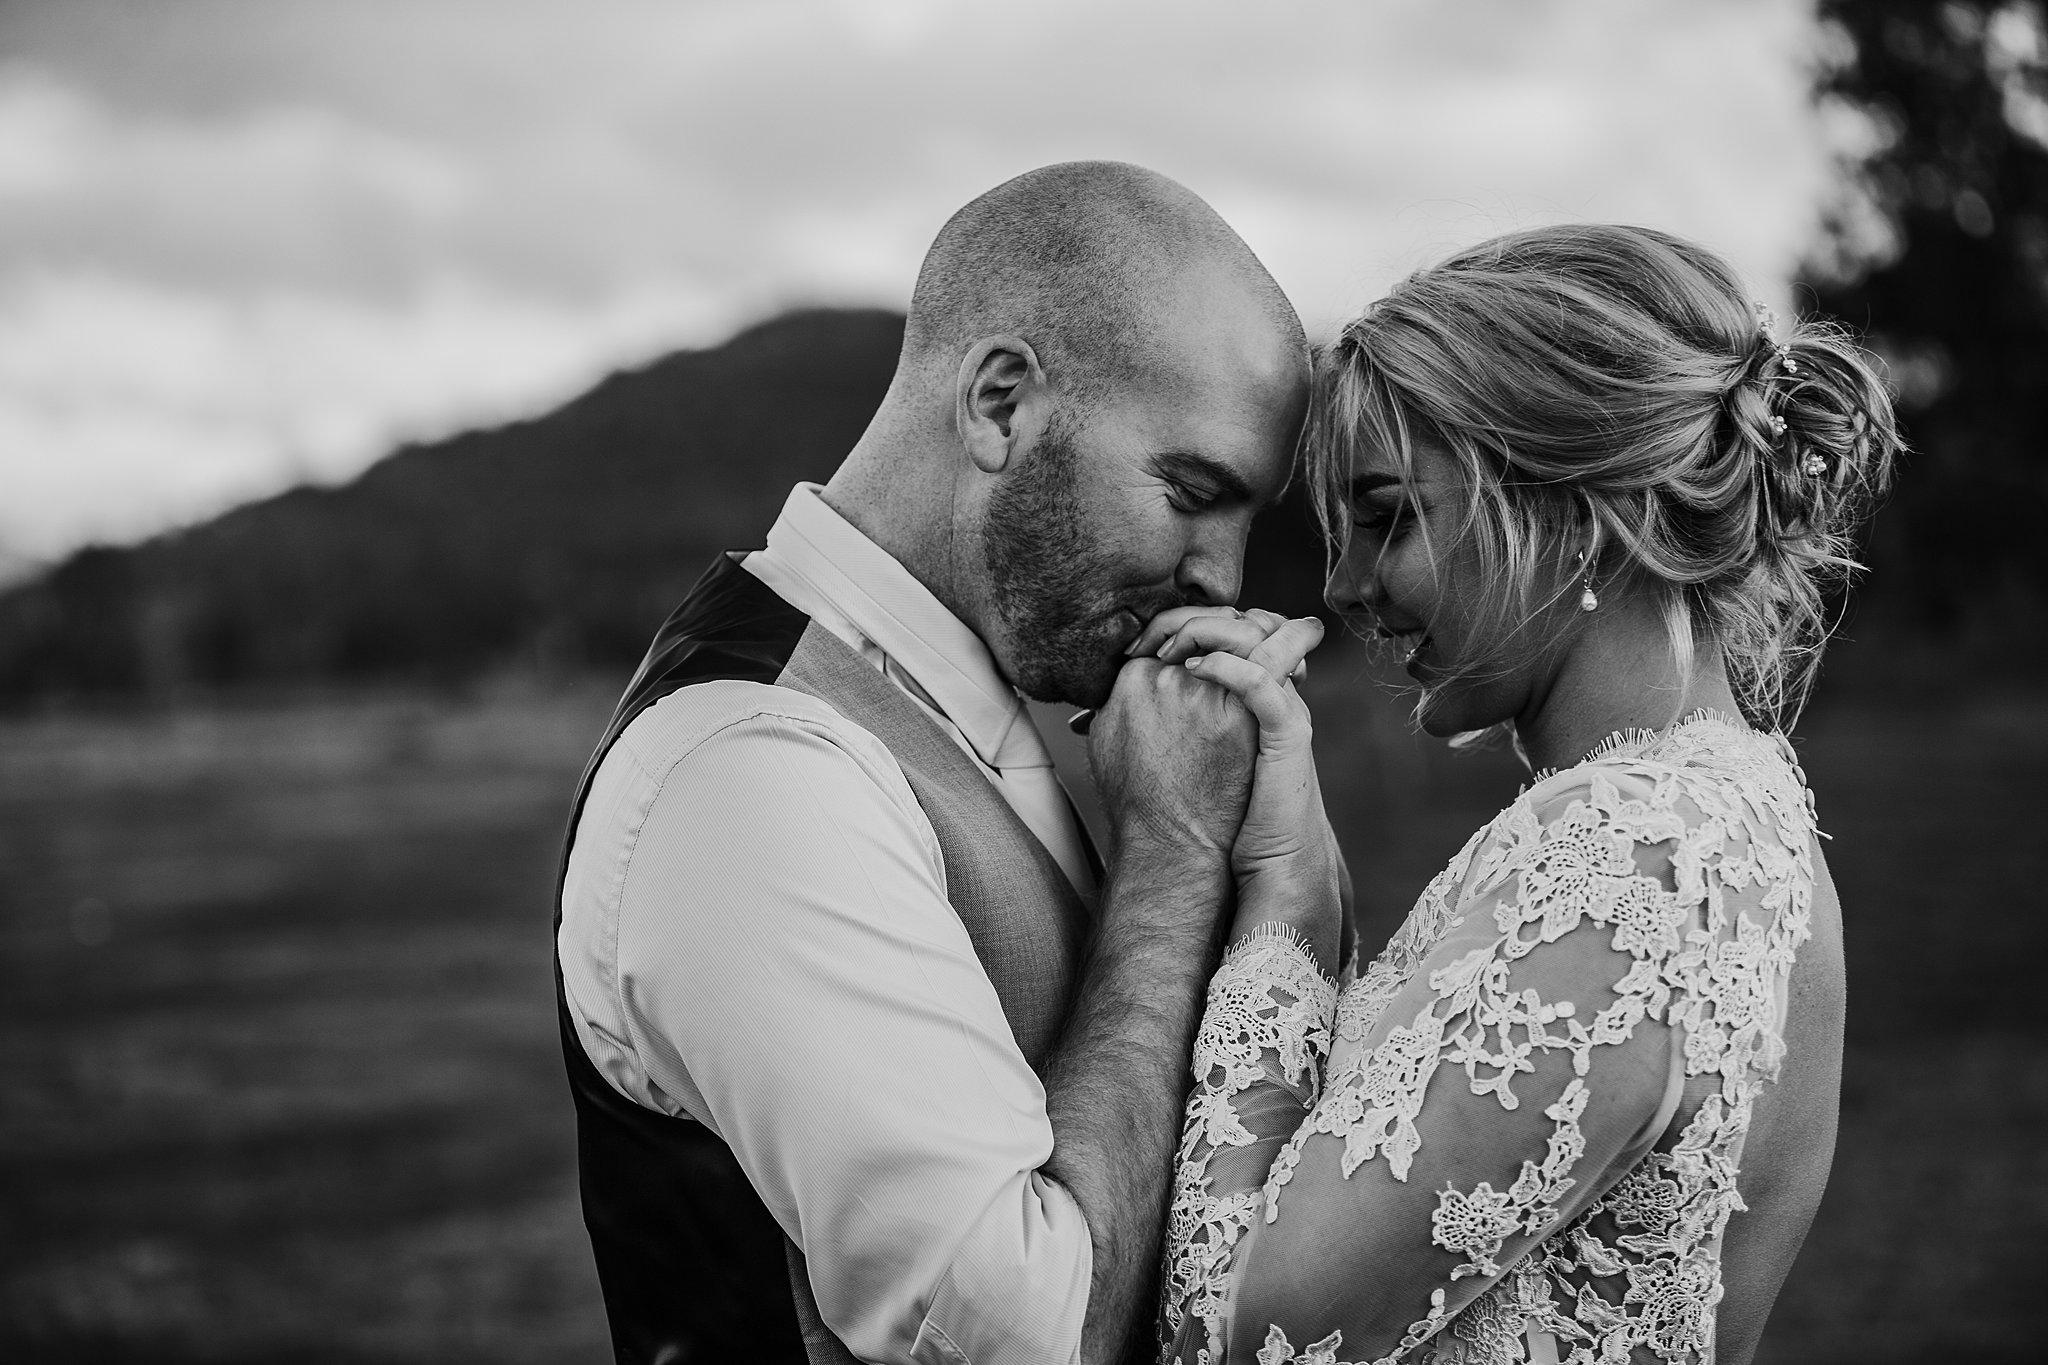 mickalathomas_puremacphotography_weddingphotographer_couplephotographer_Sheppartonphotographer_3477.jpg